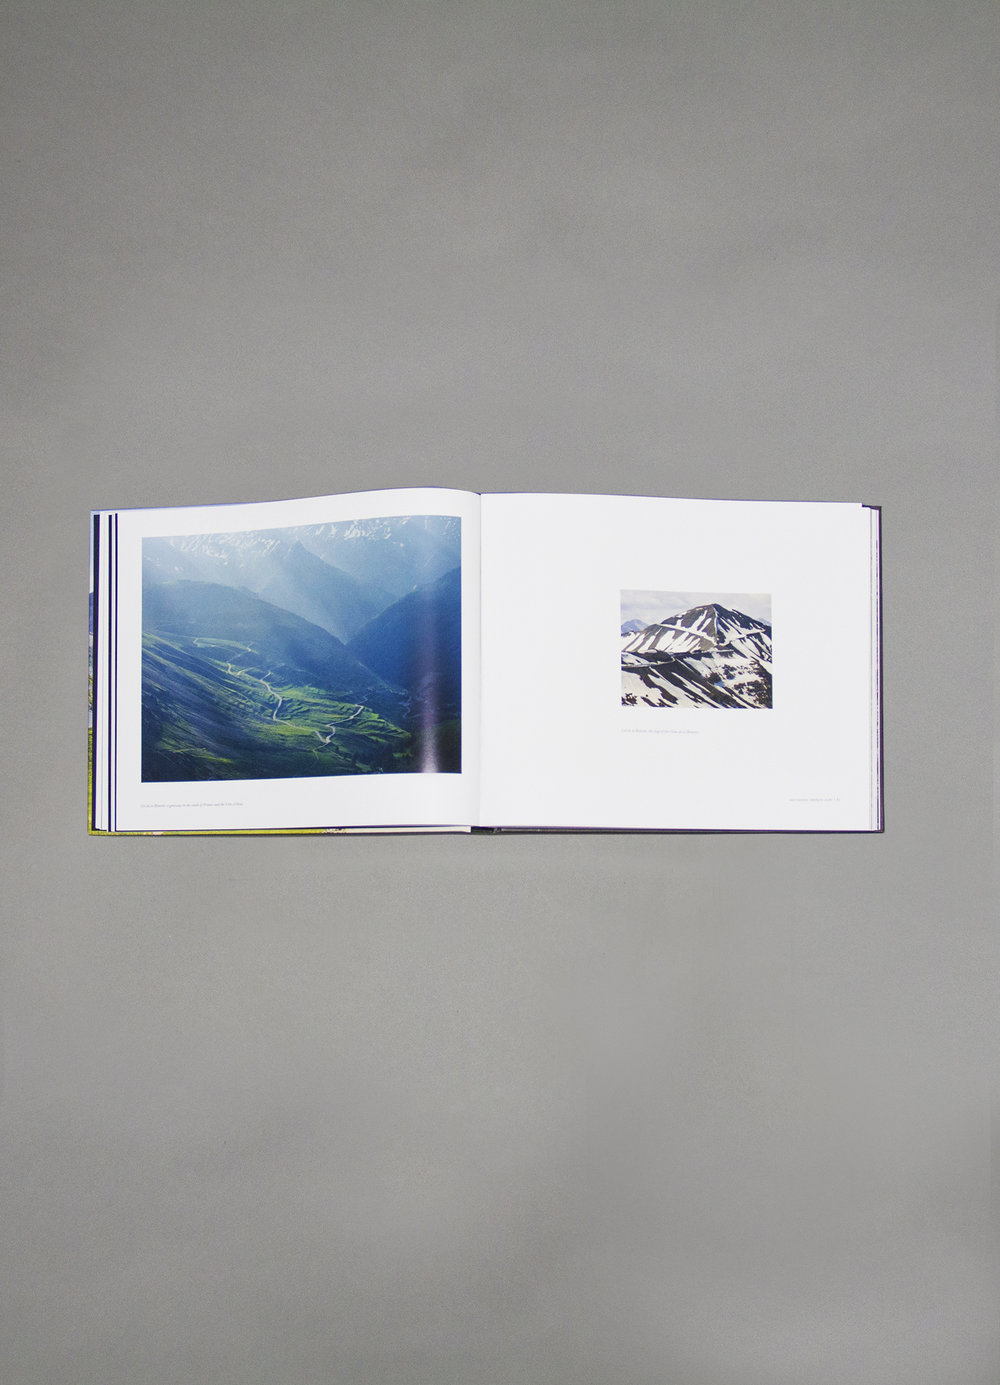 books_mountains_02.jpg